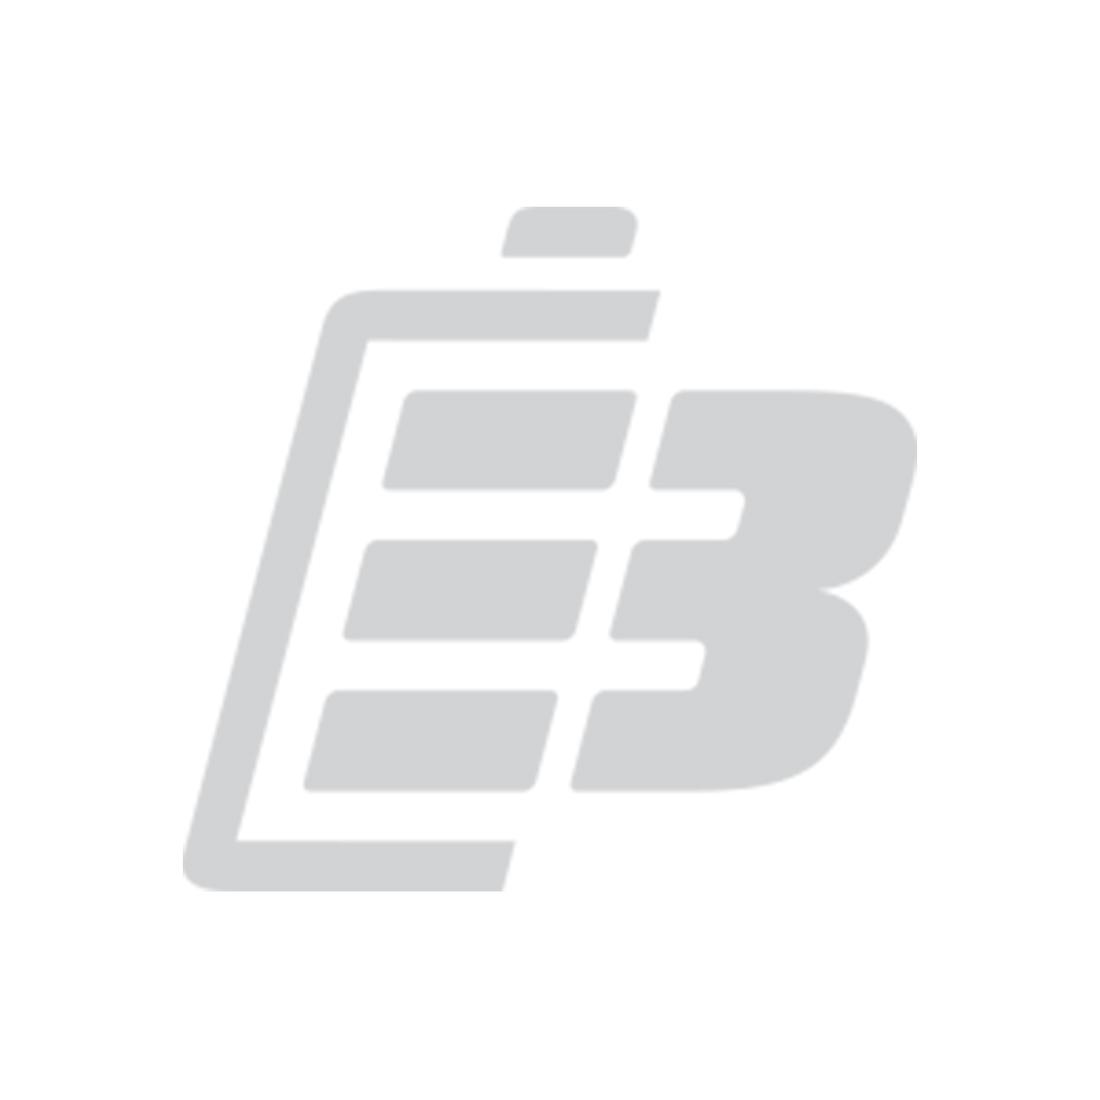 396 -397 Energizer button Battery 1